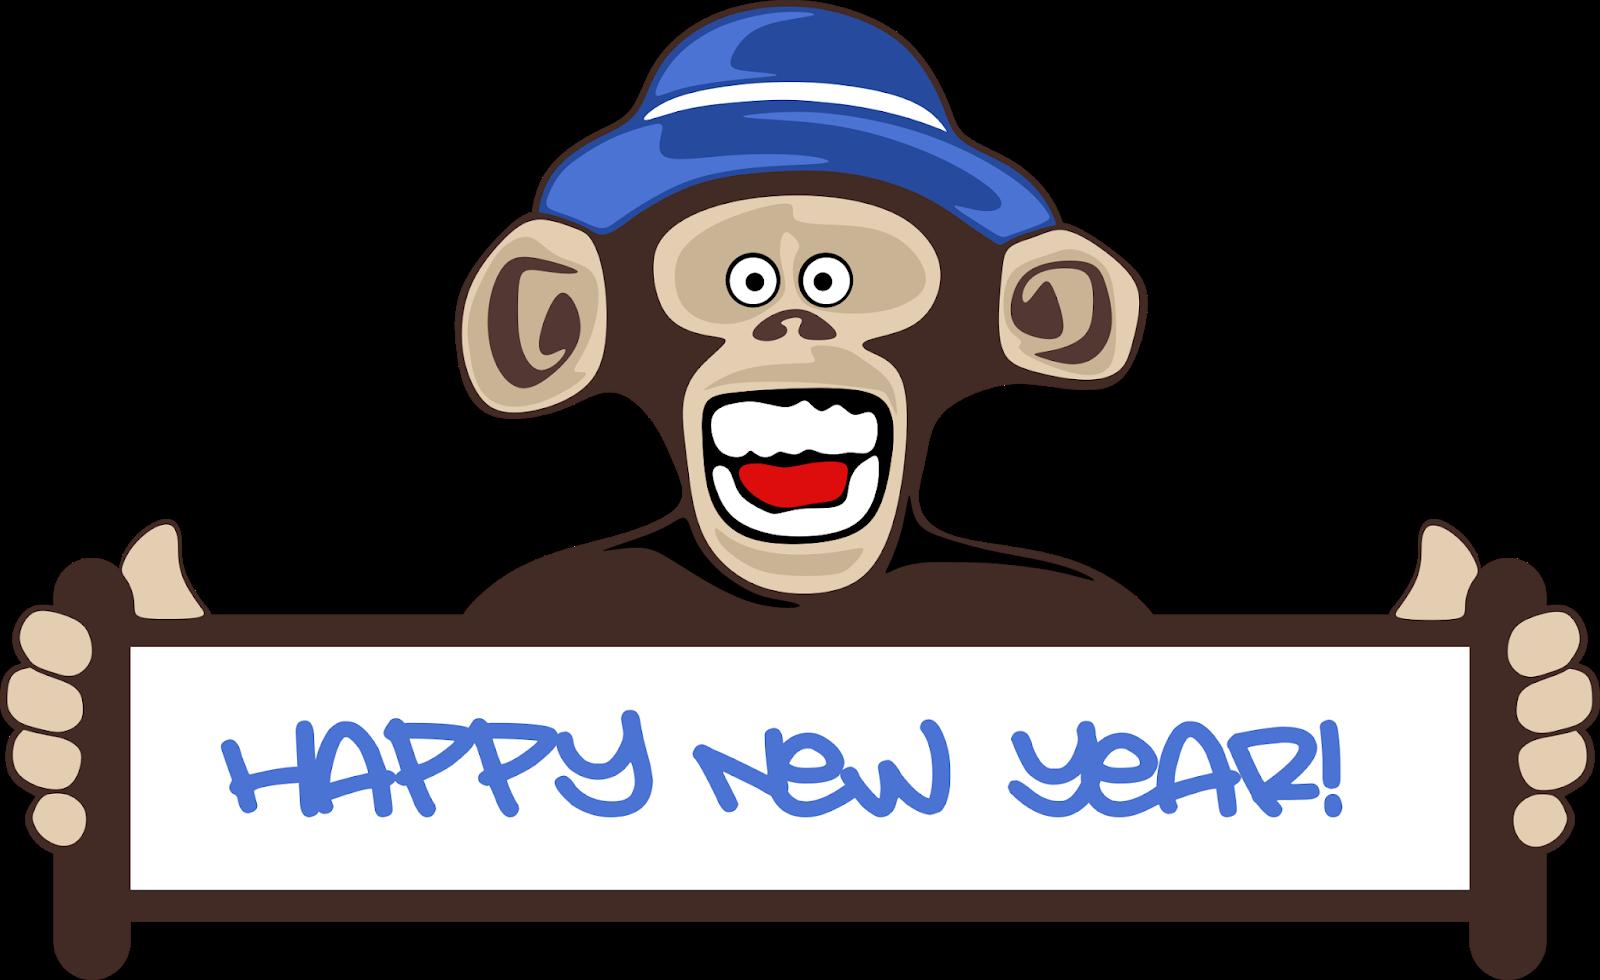 New-year-wallpaper-ultra